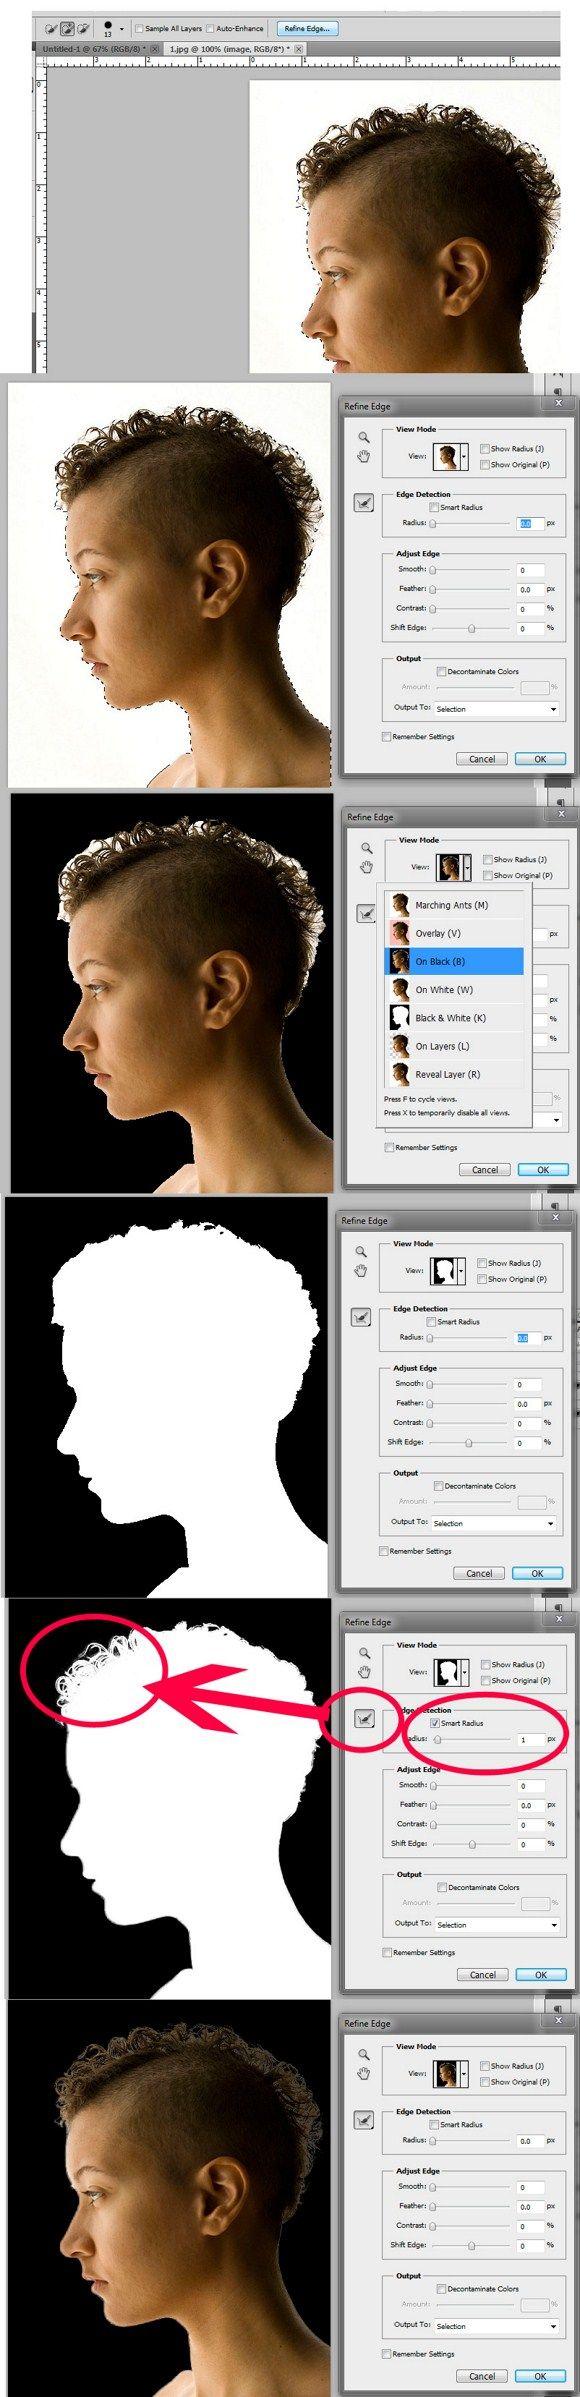 The Power of Photoshop's Refine Edge Tool tutorial